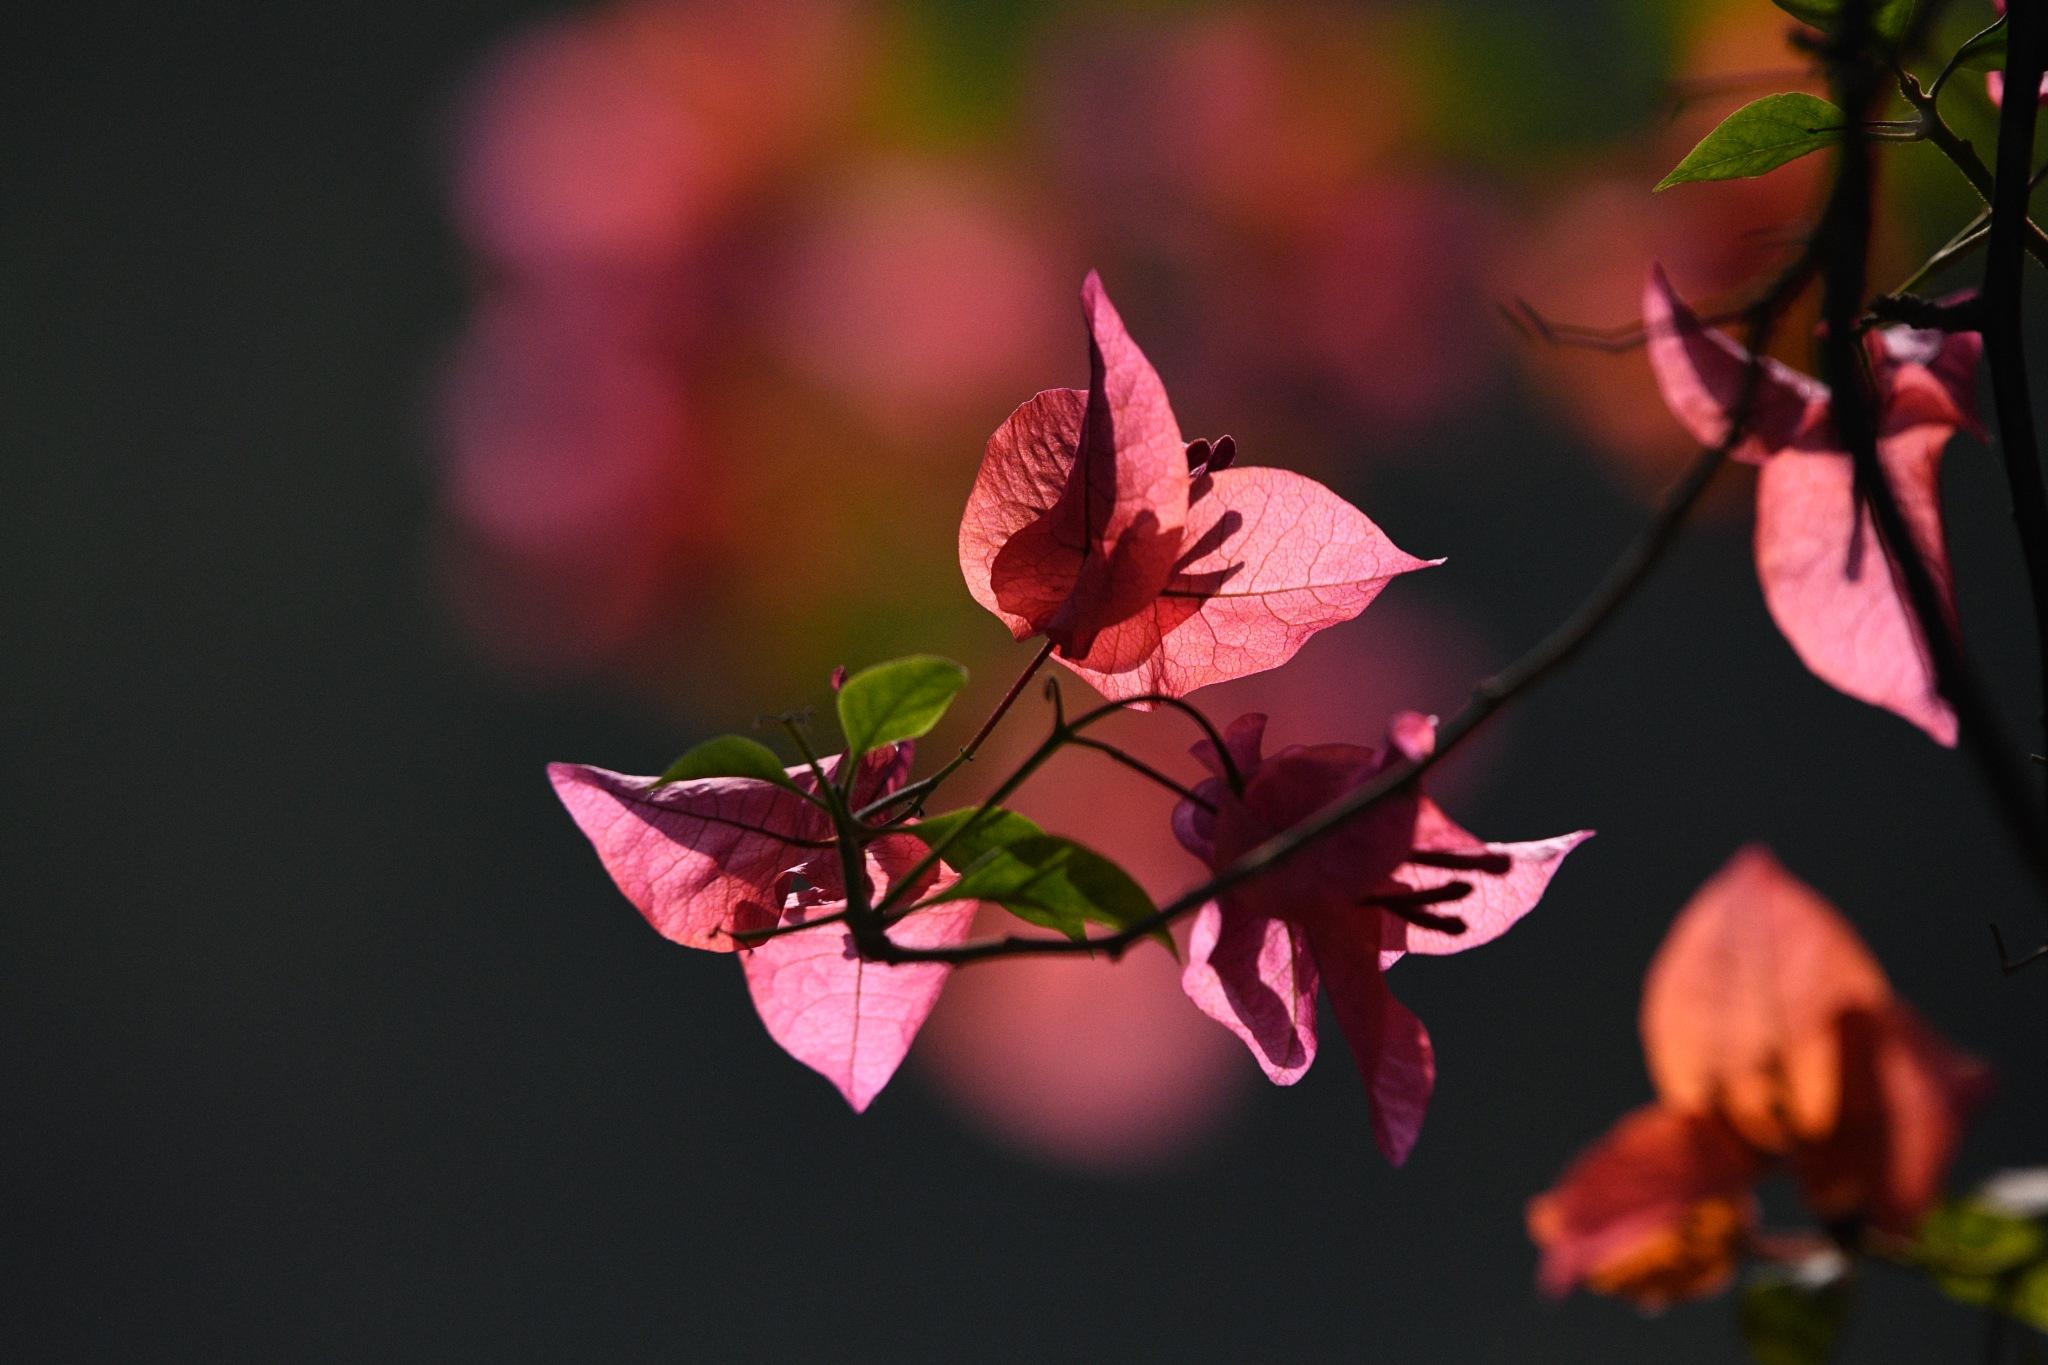 Untitled by Vijay Paul